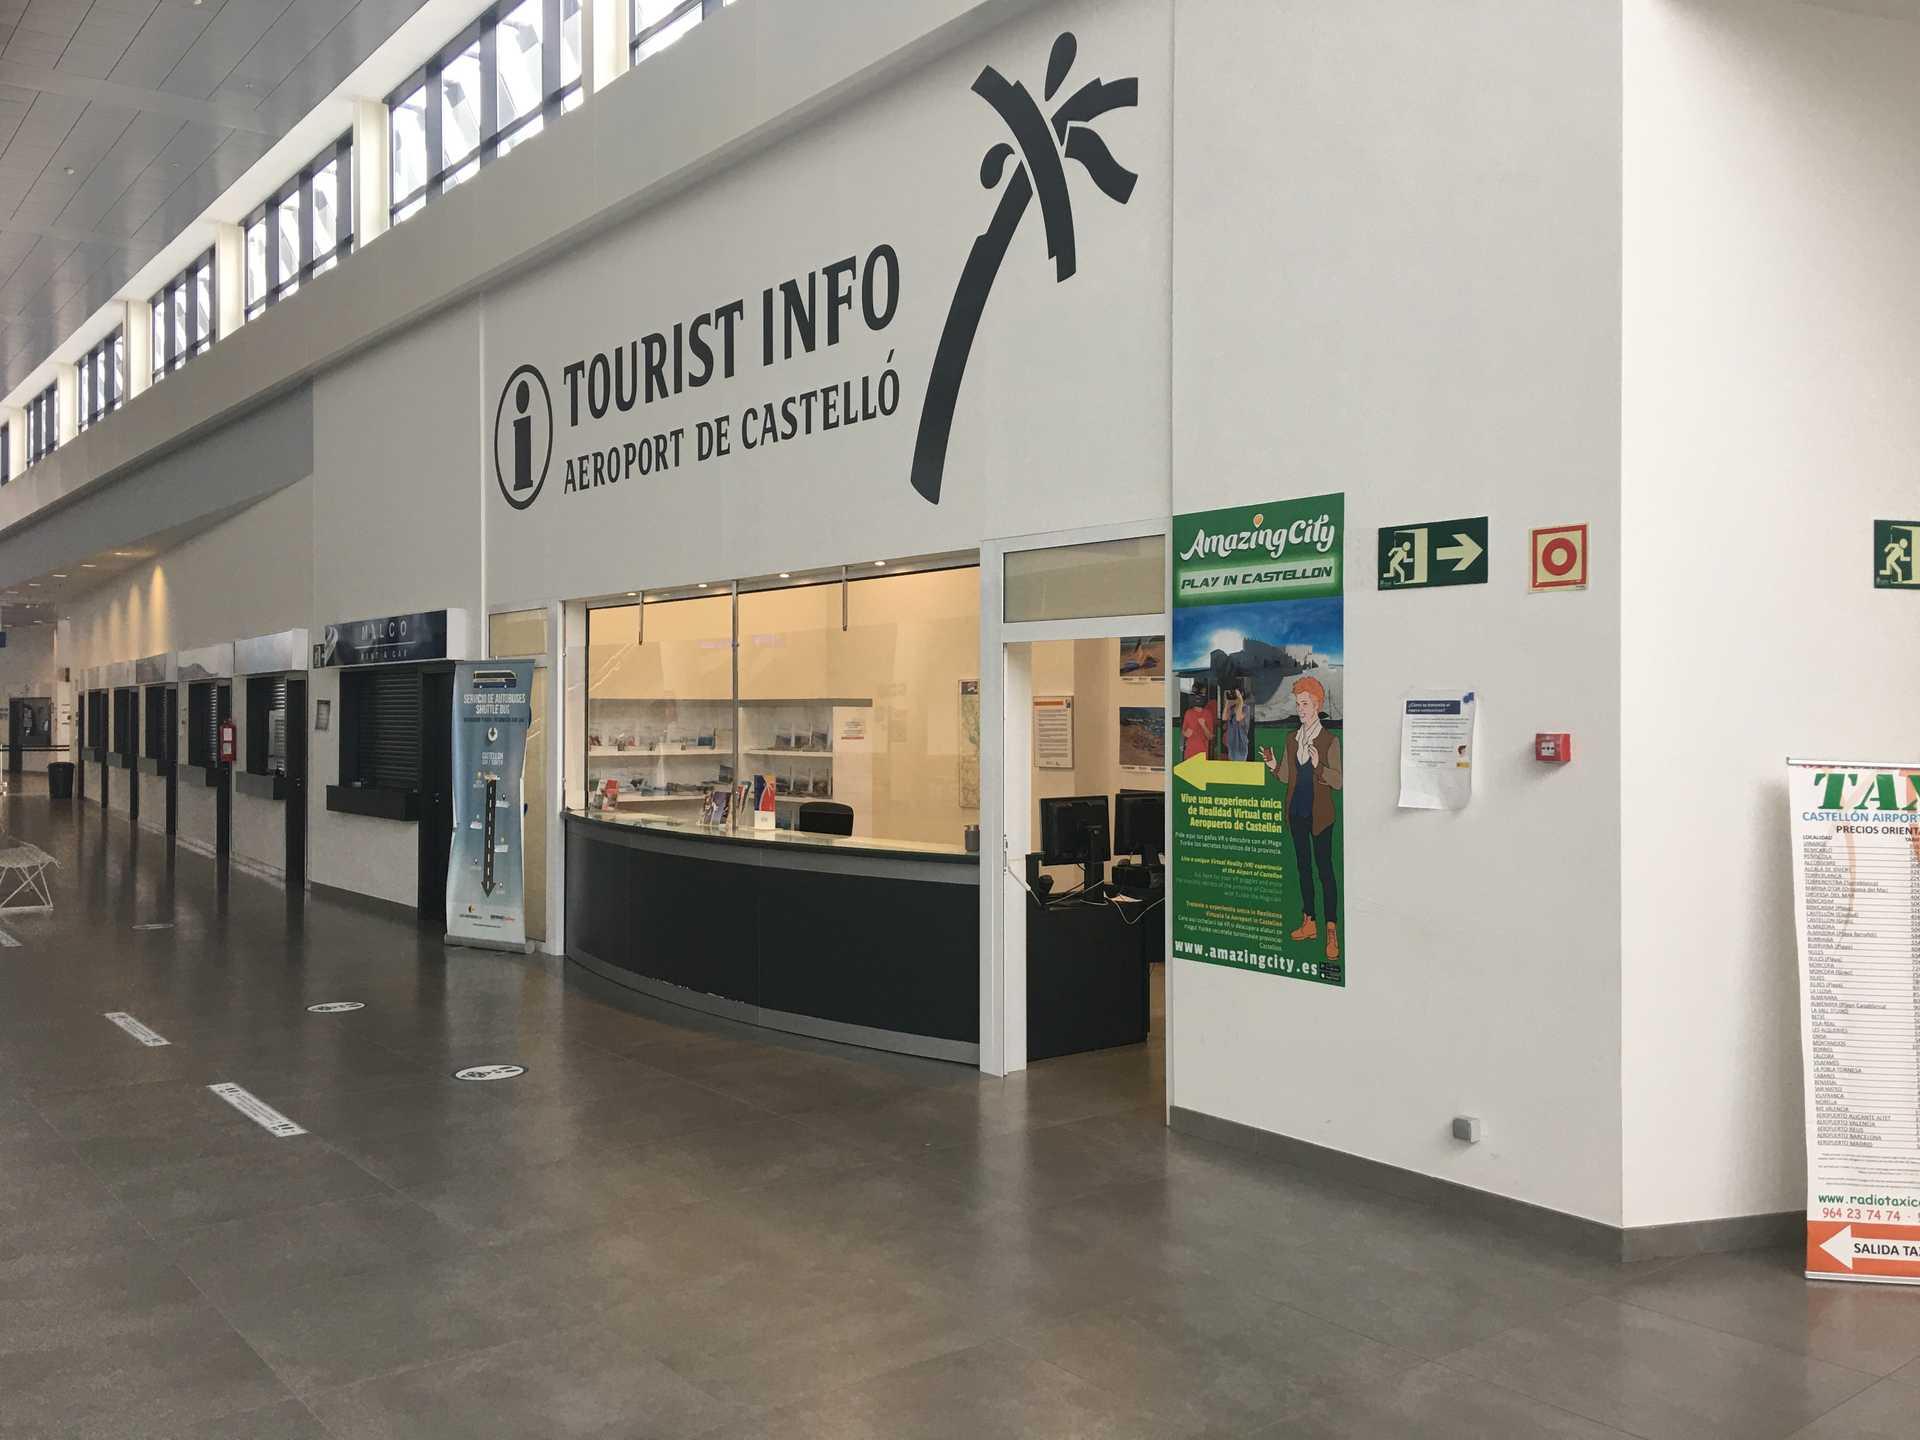 TOURIST INFO AEROPORT DE CASTELLÓ